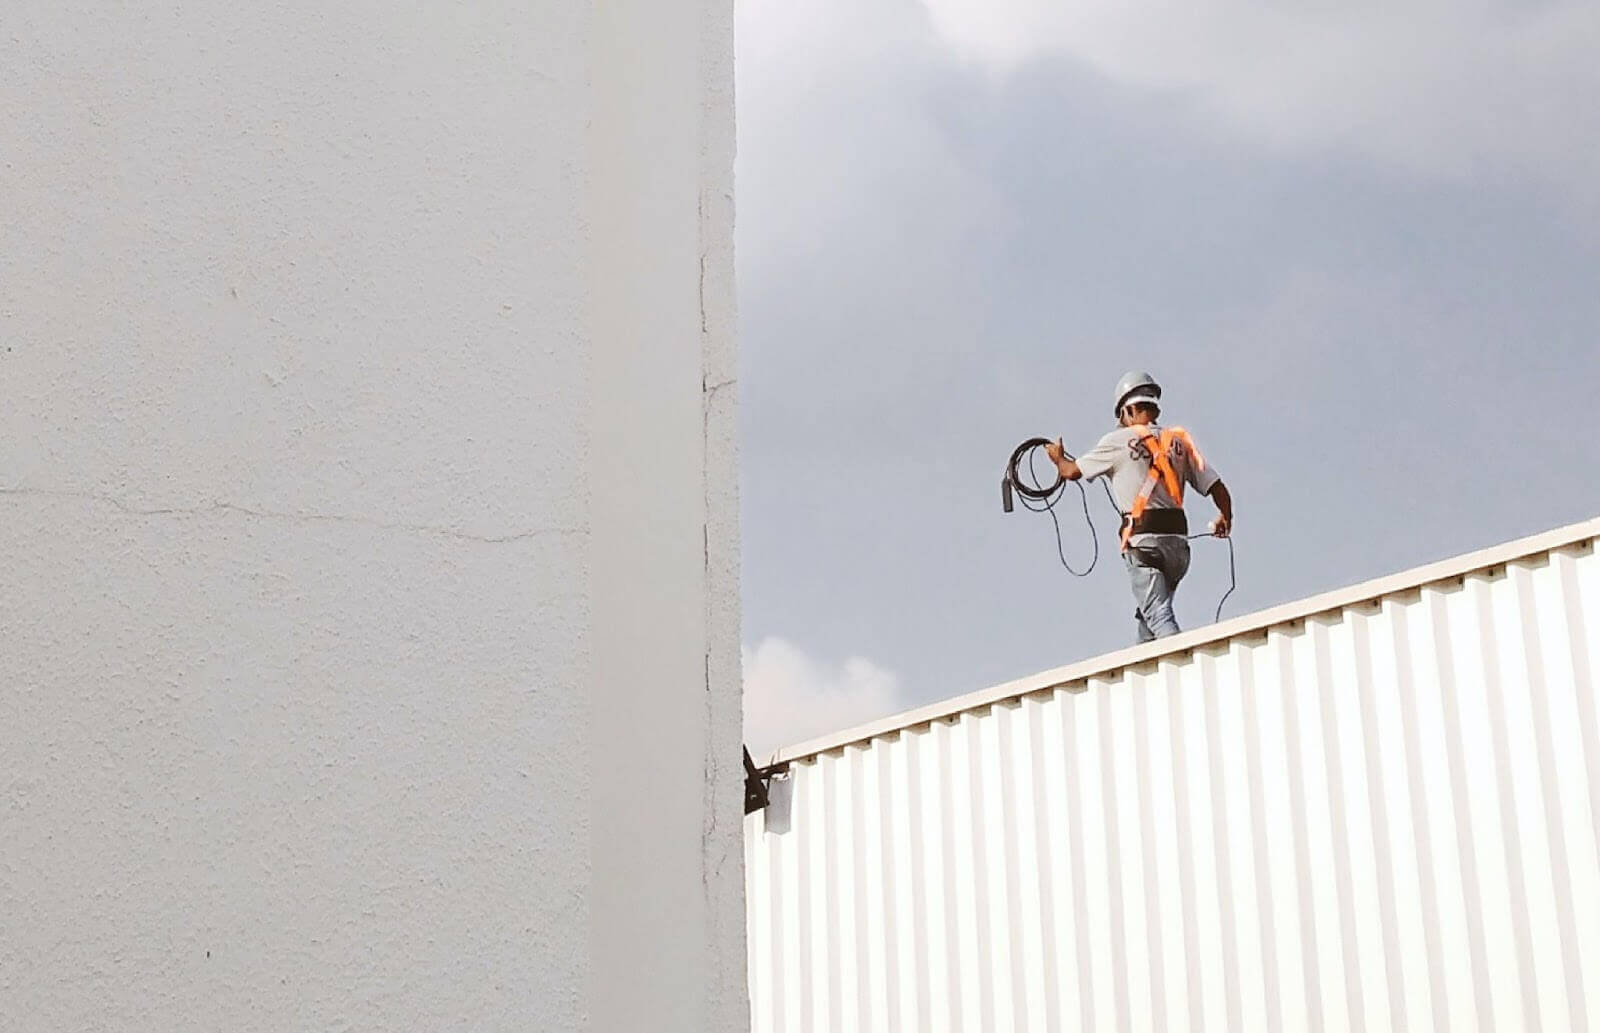 Construction worker walking on metal building roof